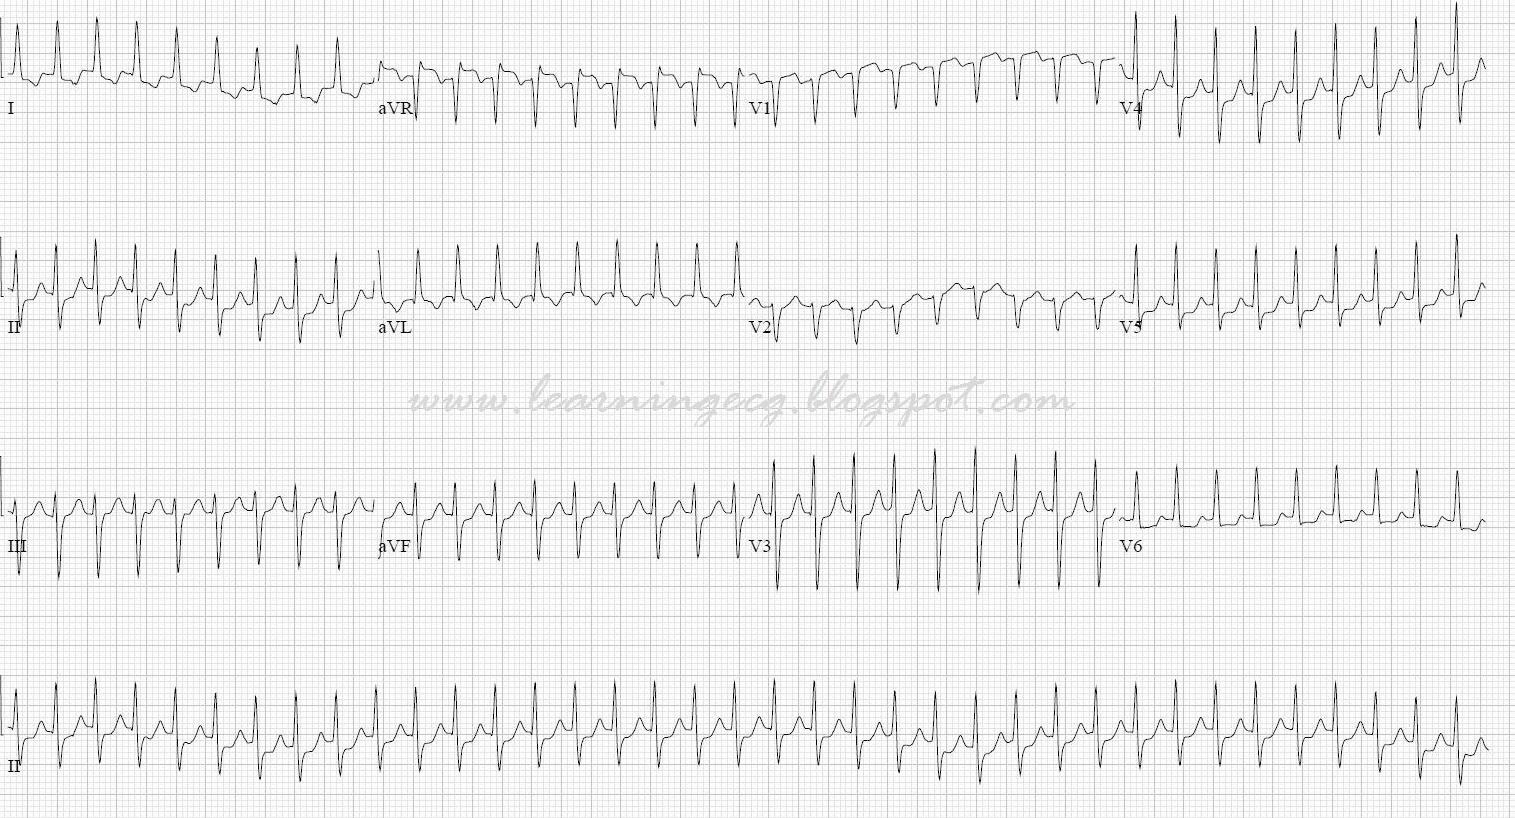 Ecg Rhythms A Supraventricular Tachycardia